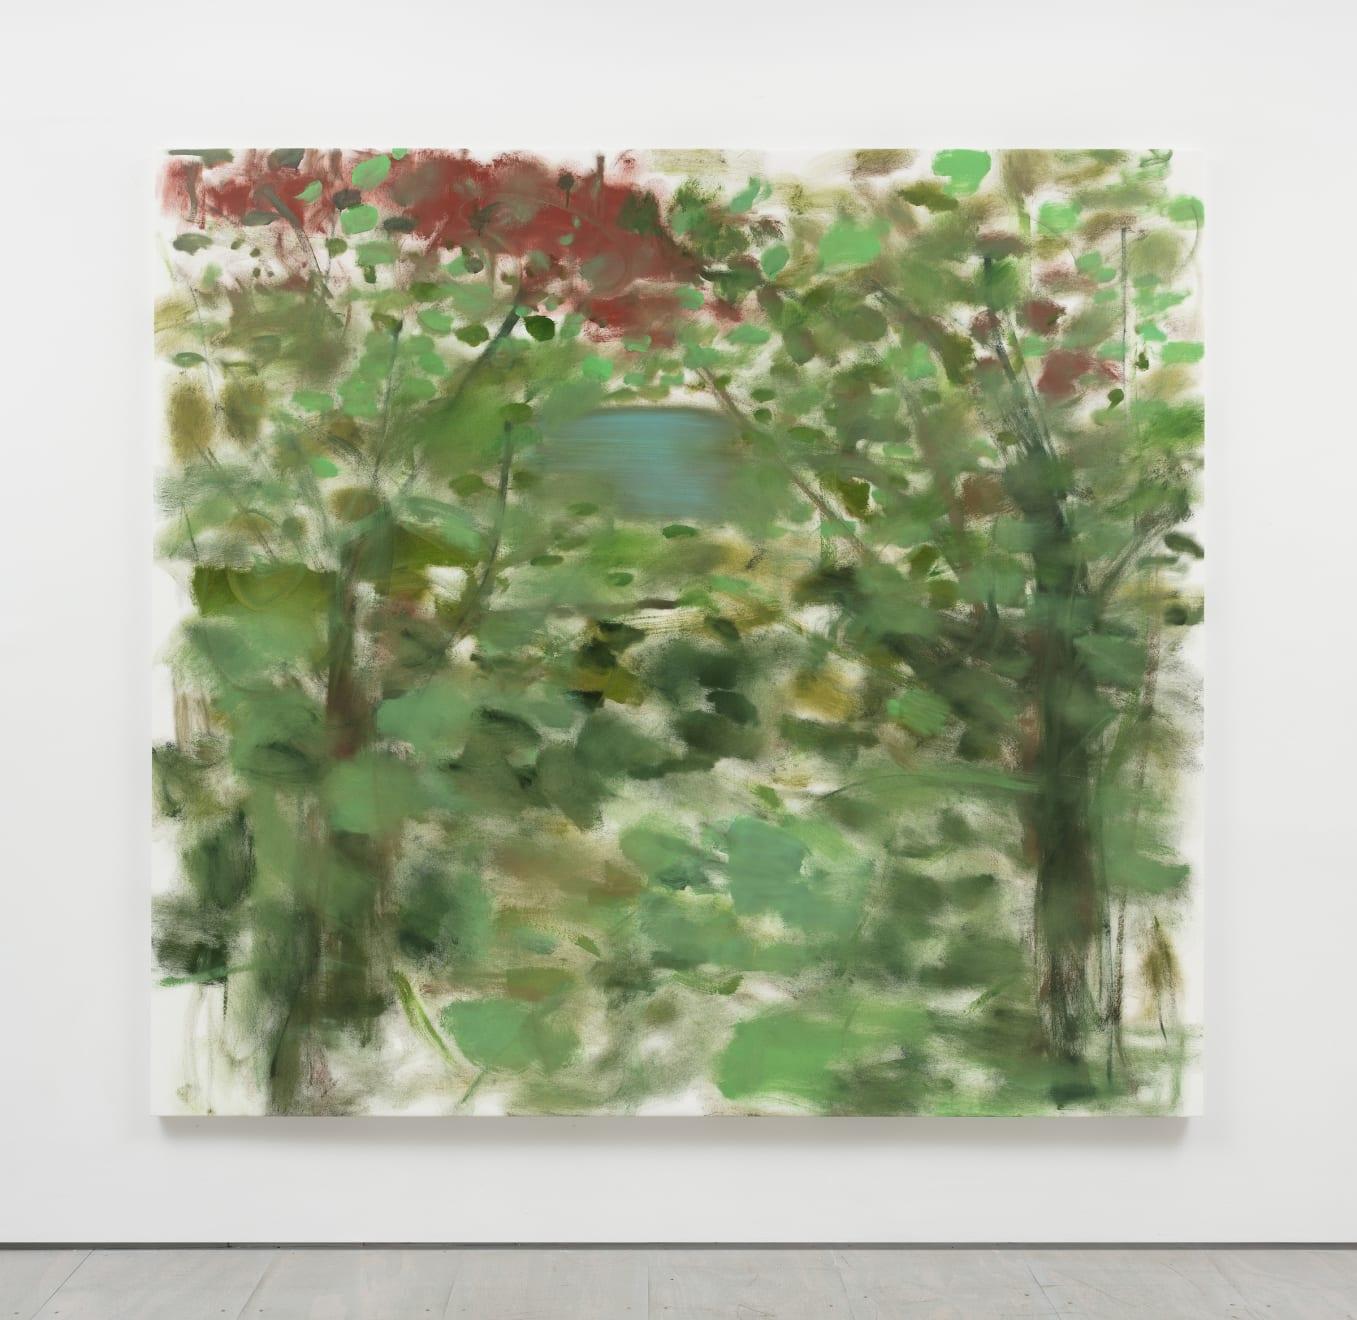 Trevor Shimizu, Water Through Trees, 2020